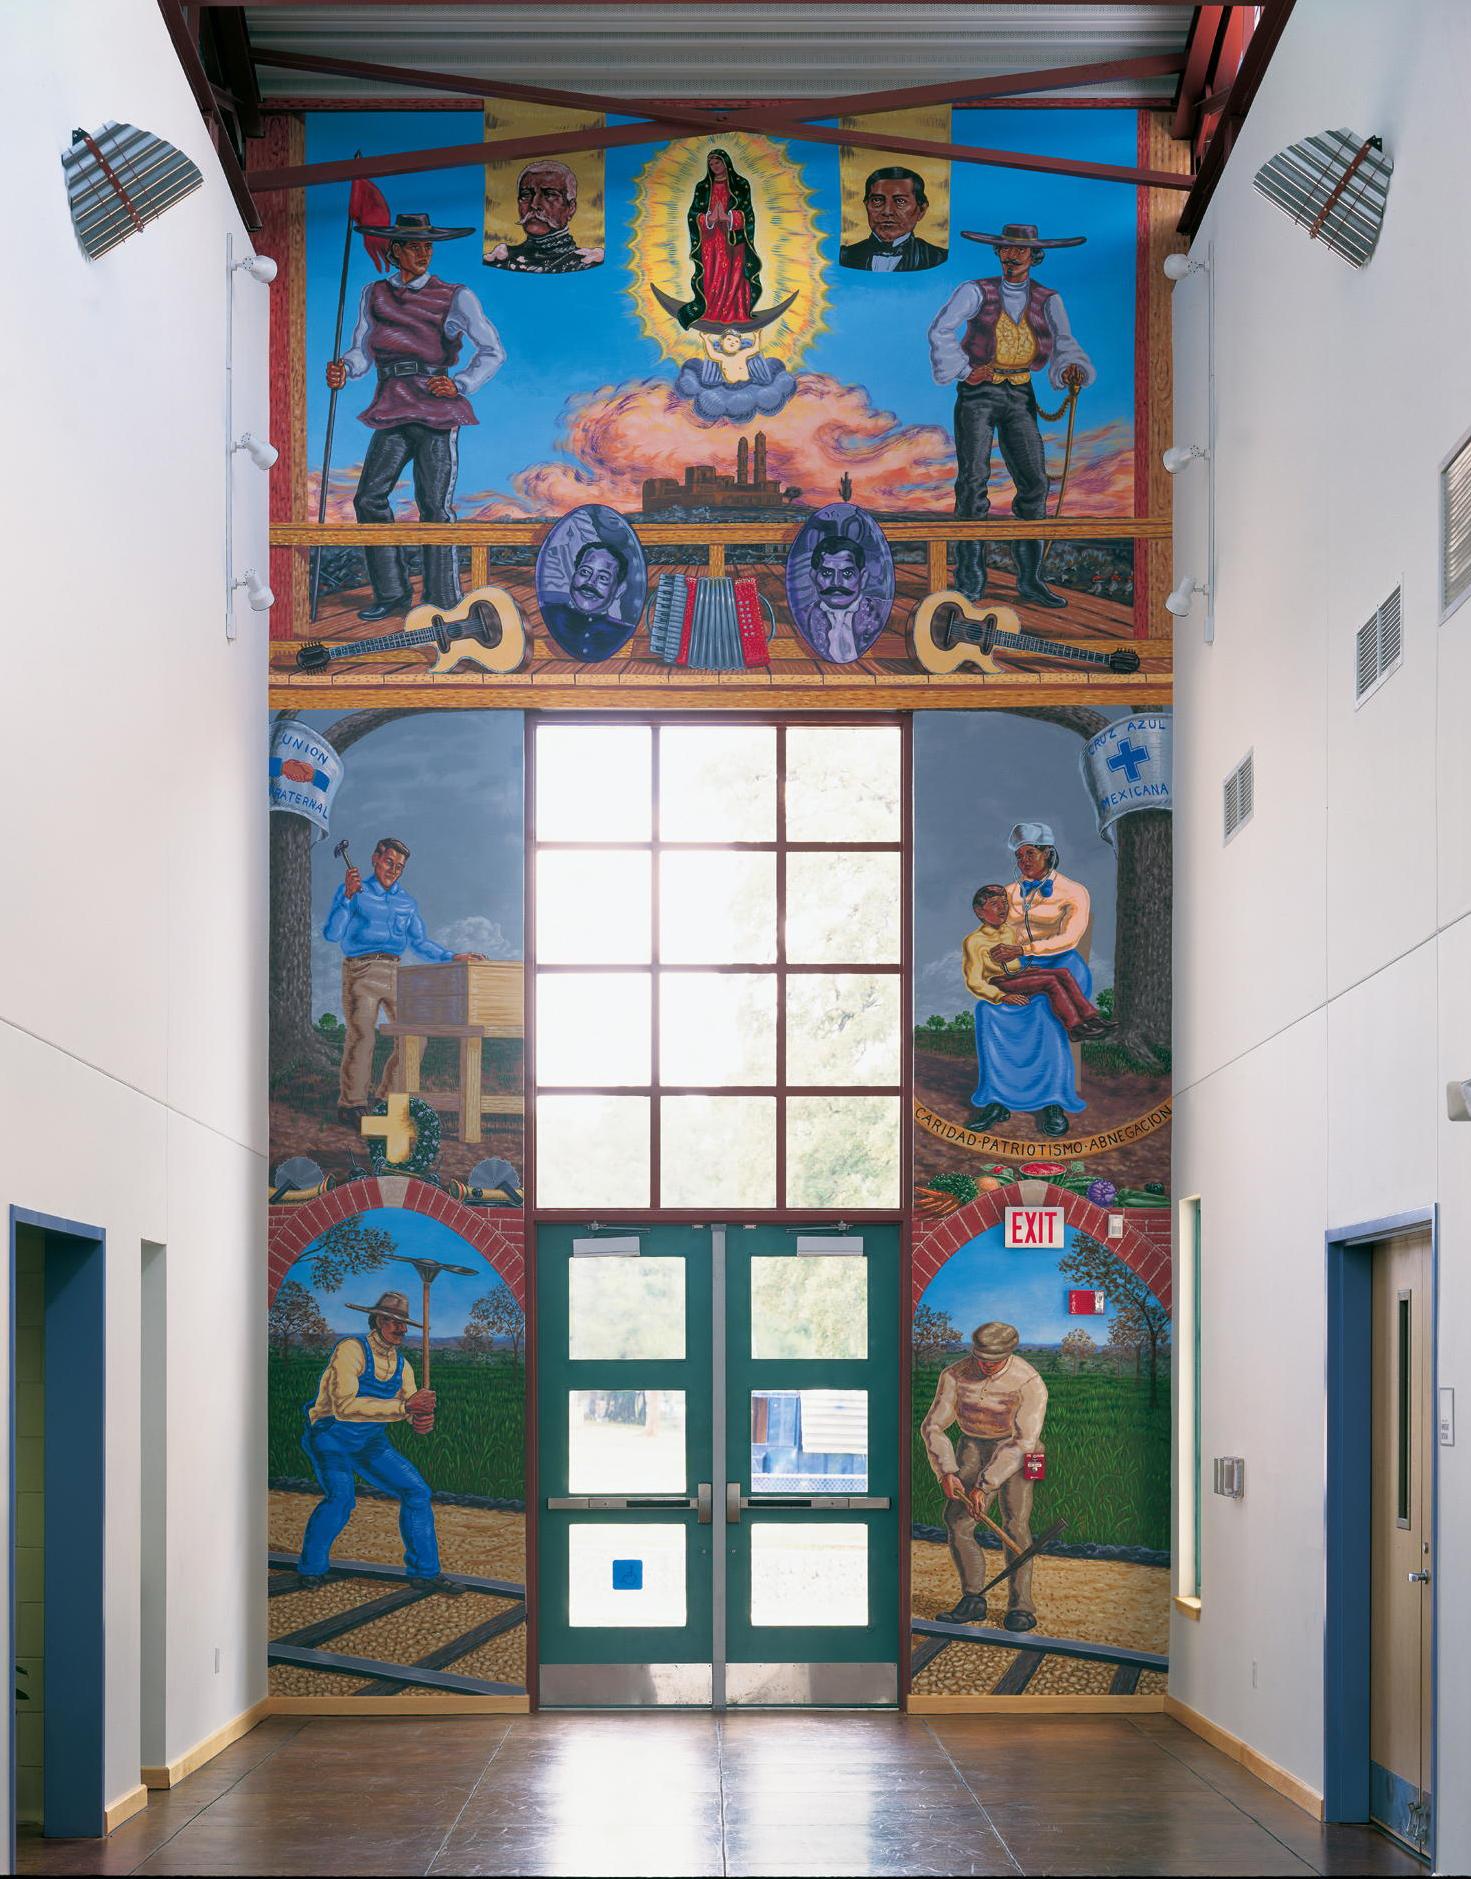 Zaragoza Recreation Center